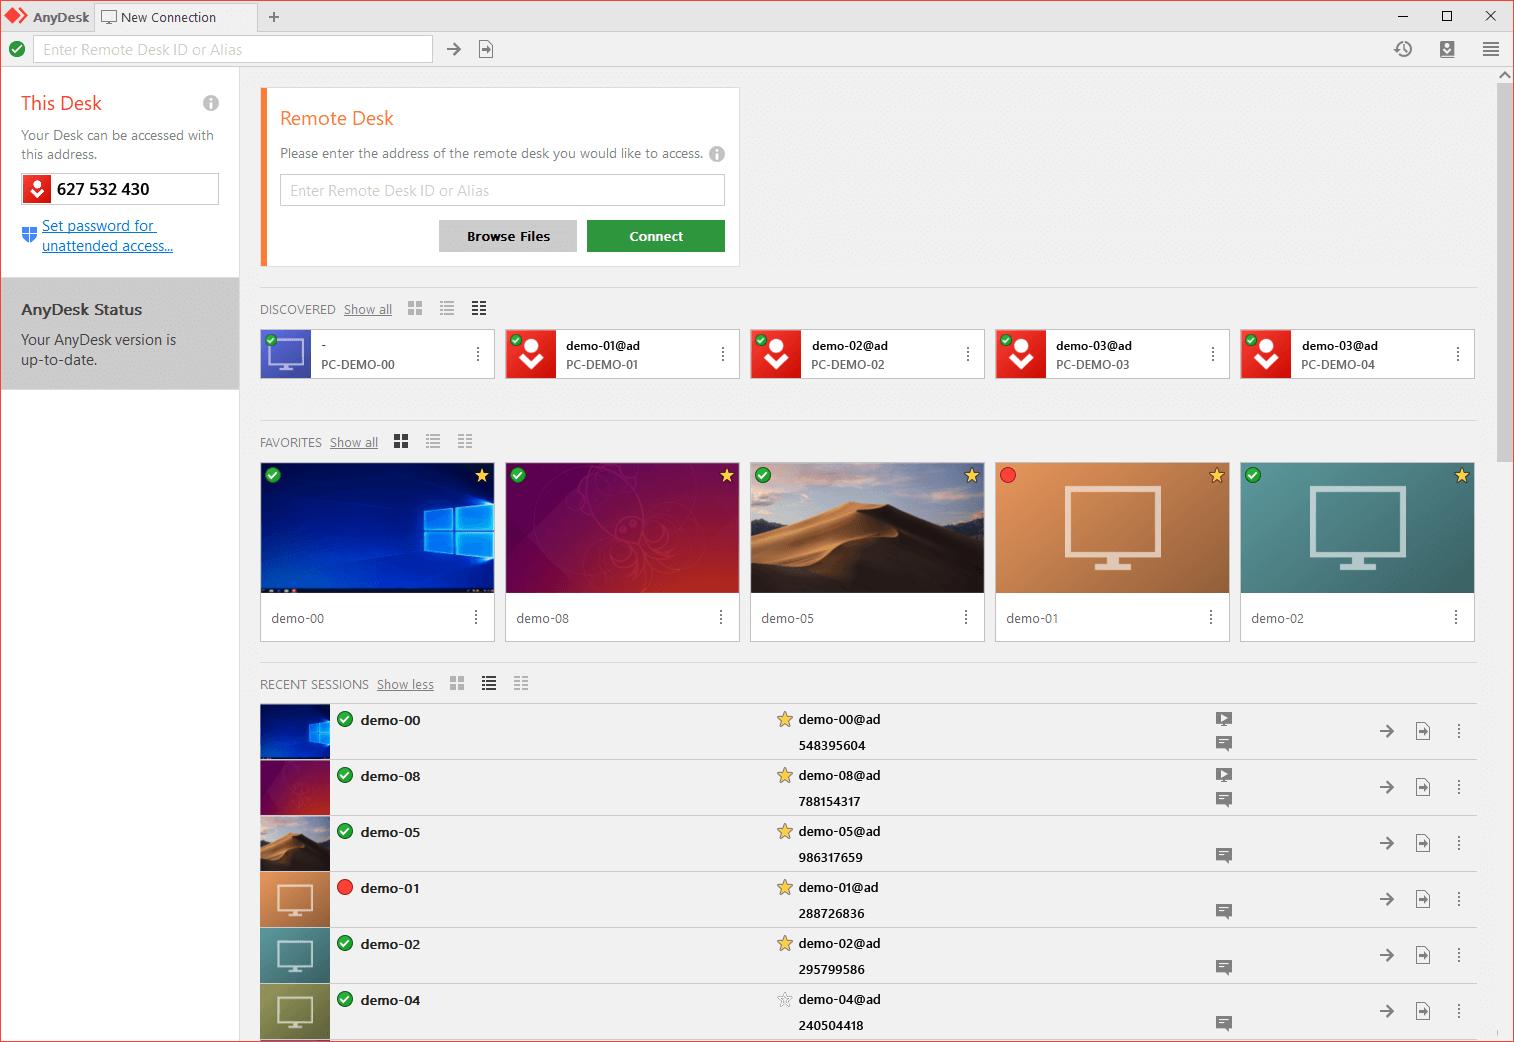 AnyDesk_Screenshot